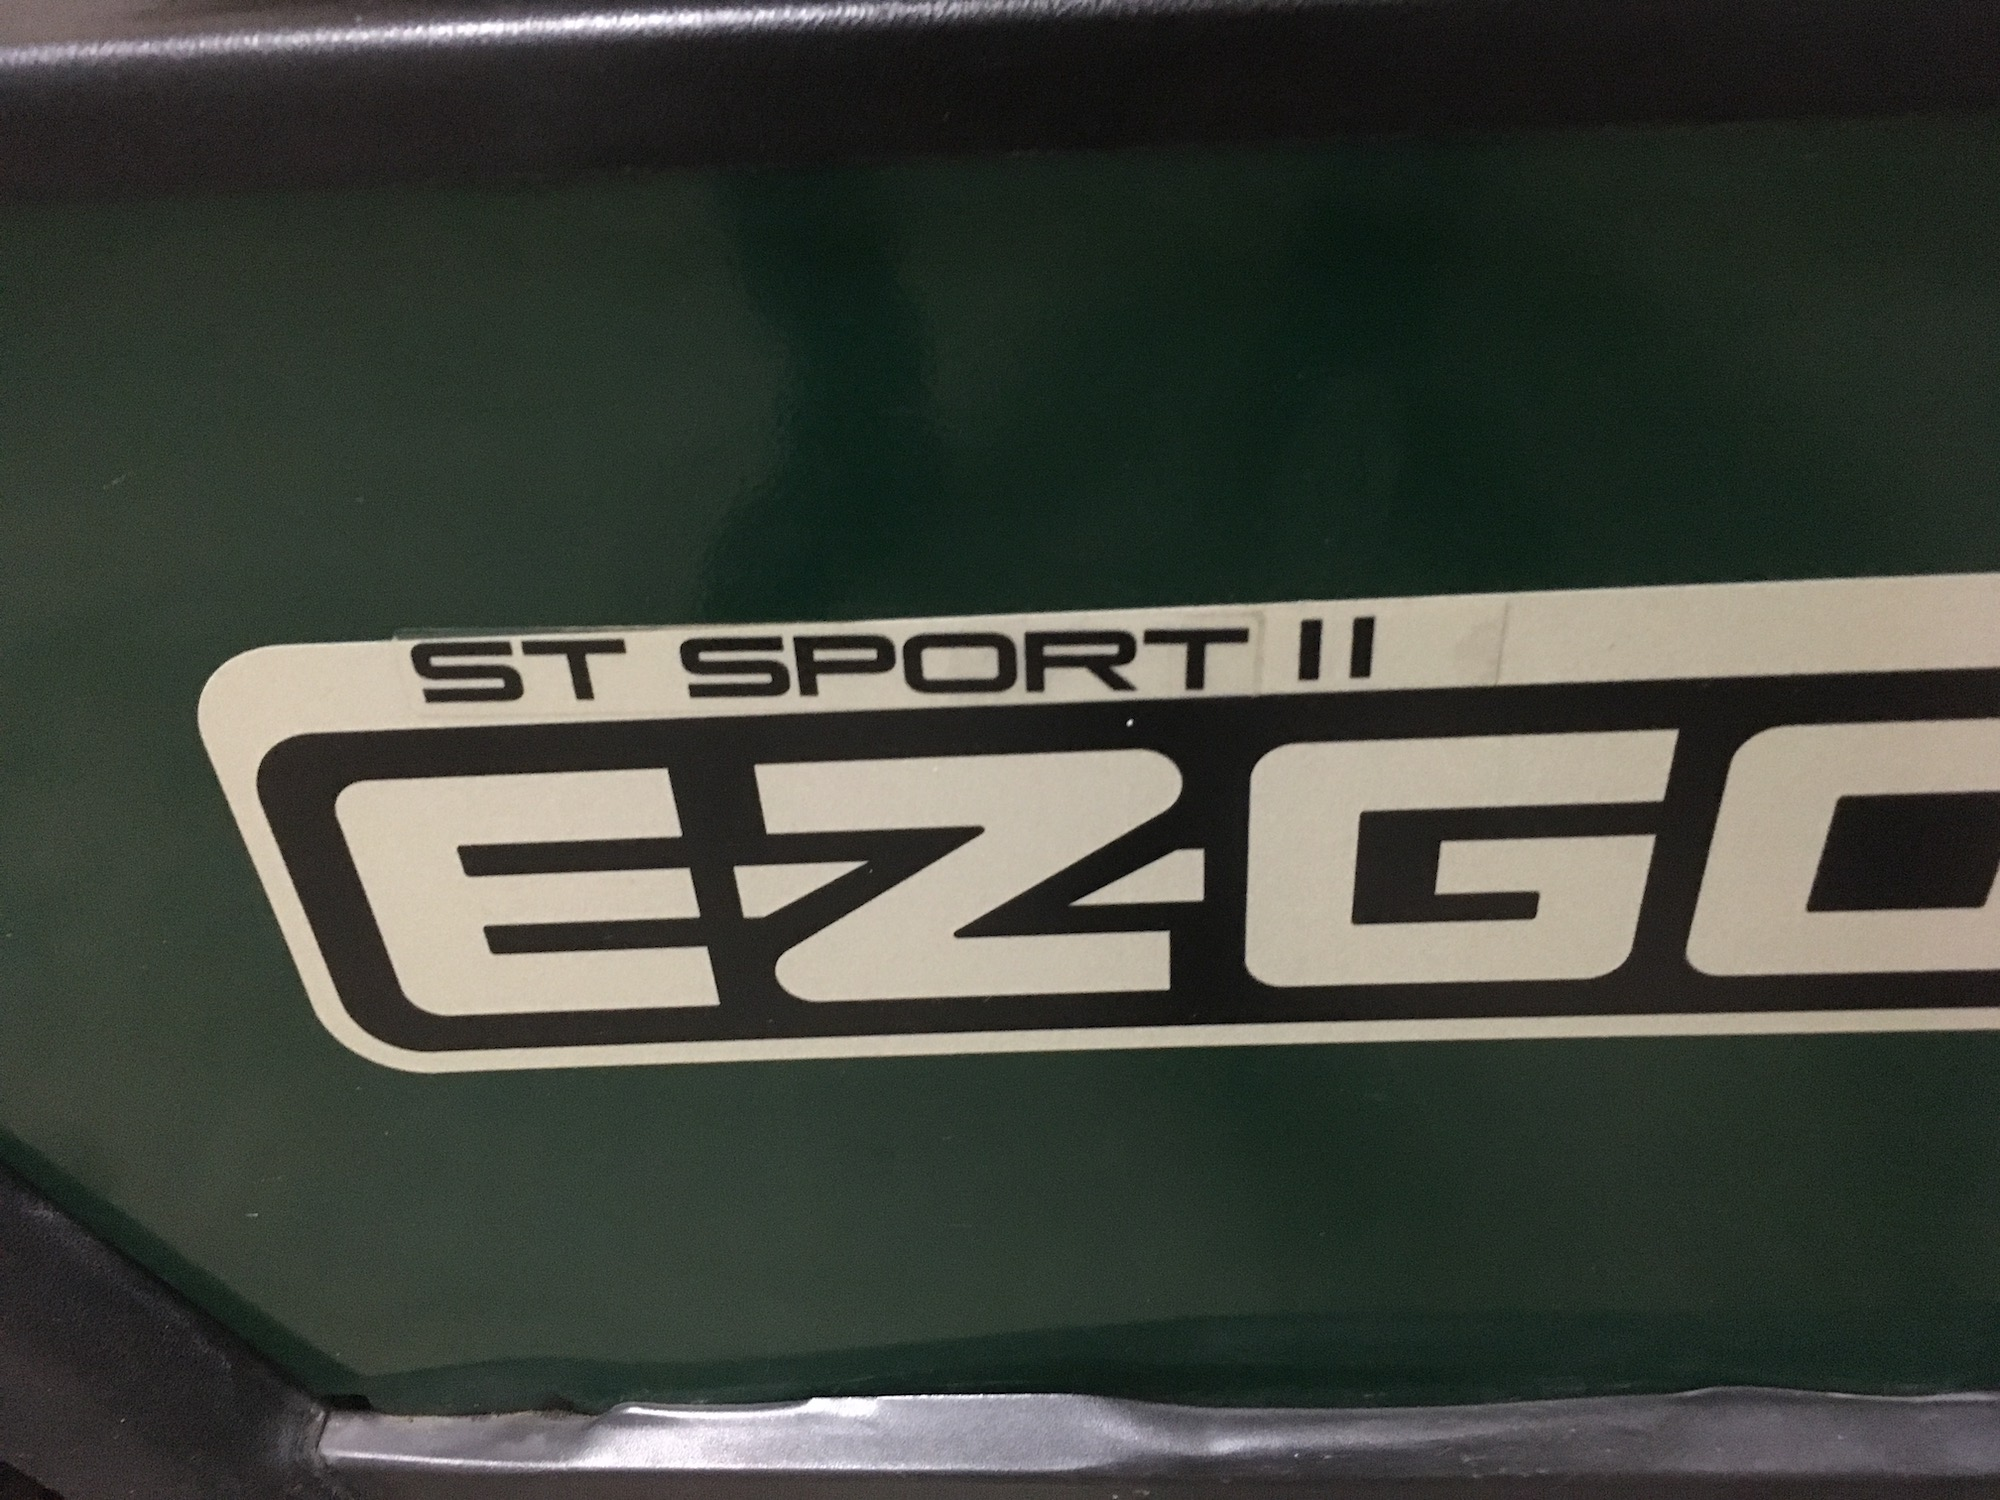 EZGO-ST-Sport-II-UtilityCart_06